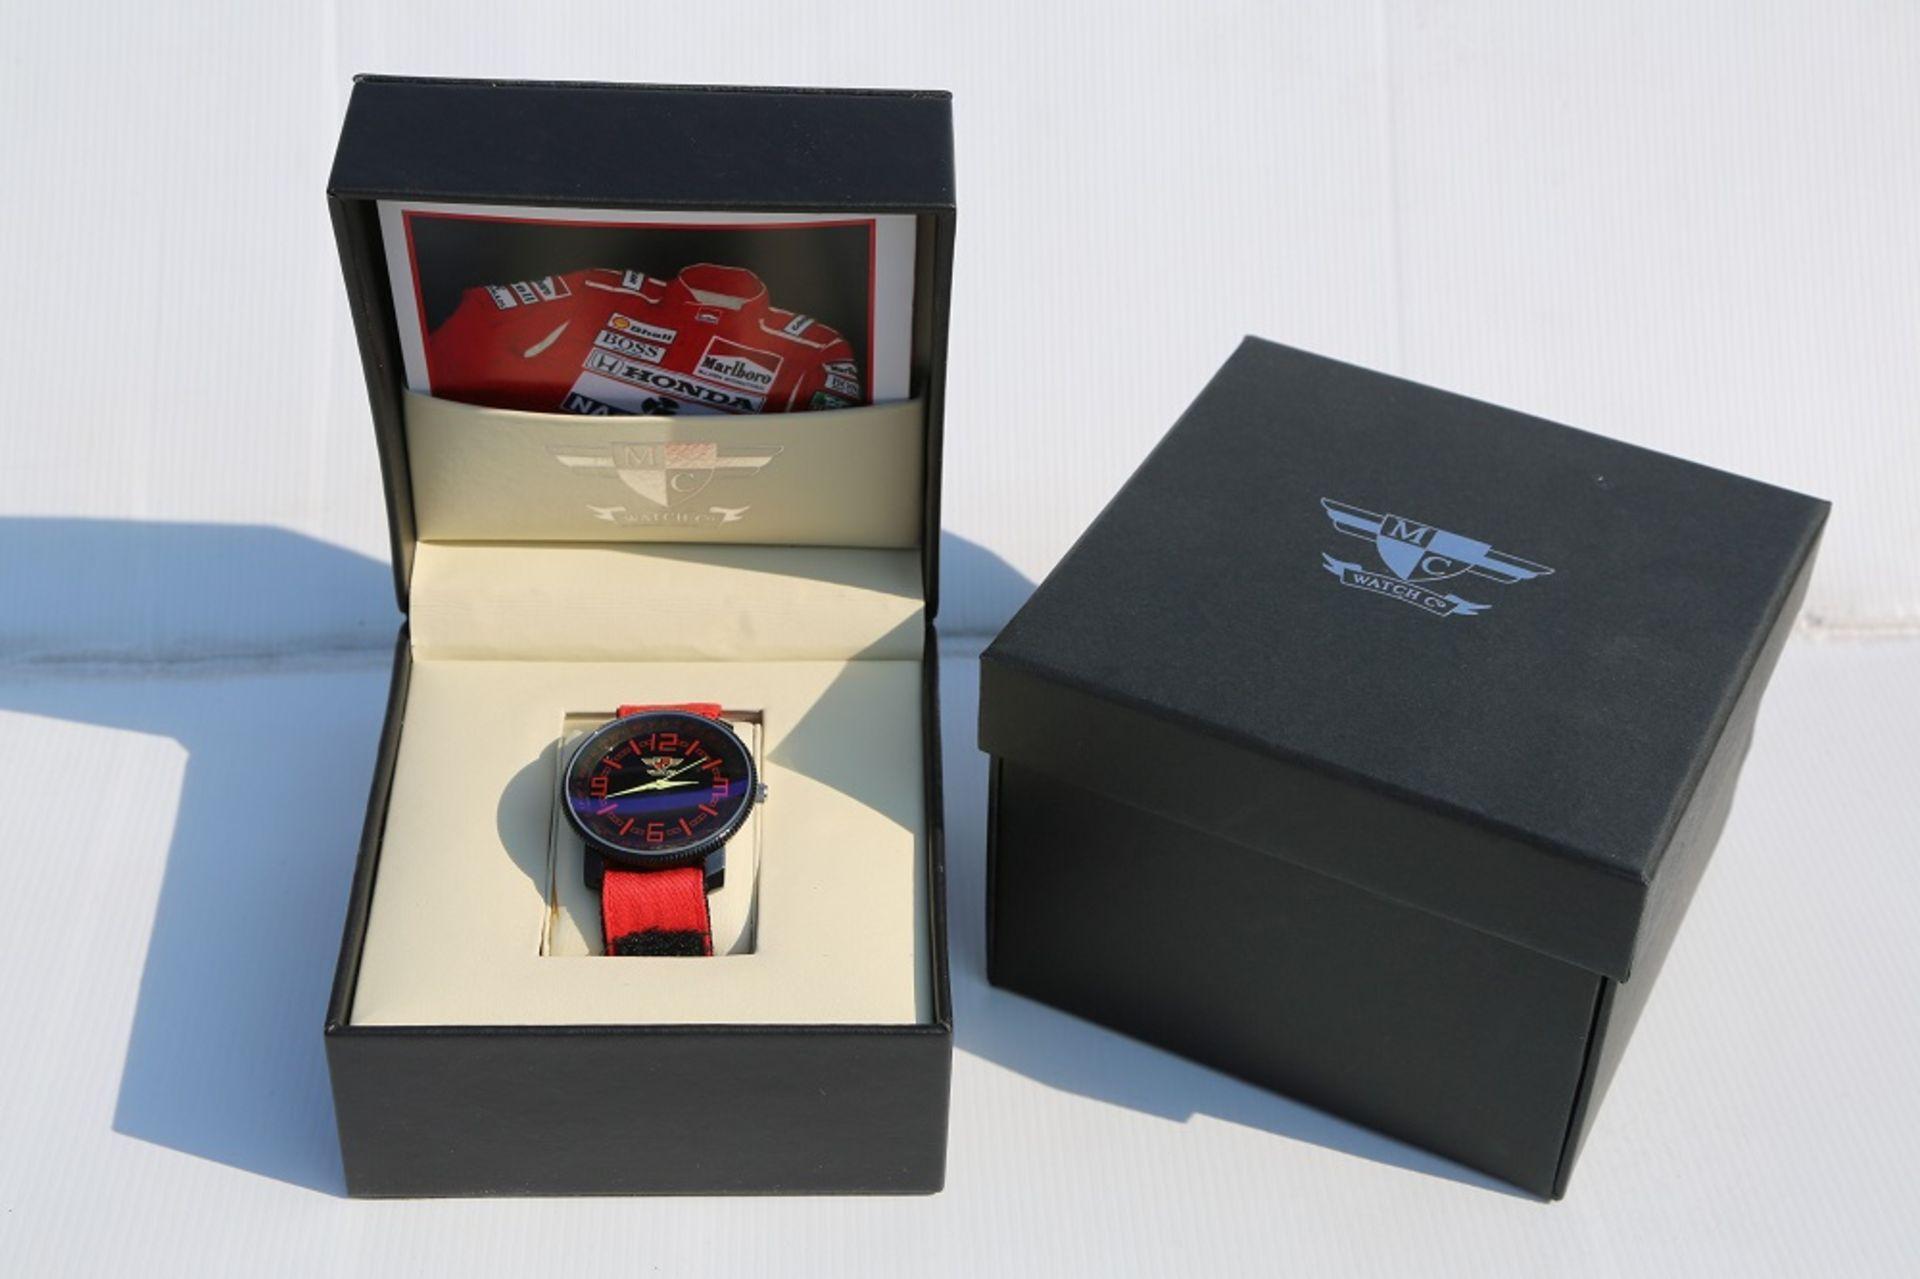 Lot 3 - Limited Edition Ayrton Senna Watch (Gents)